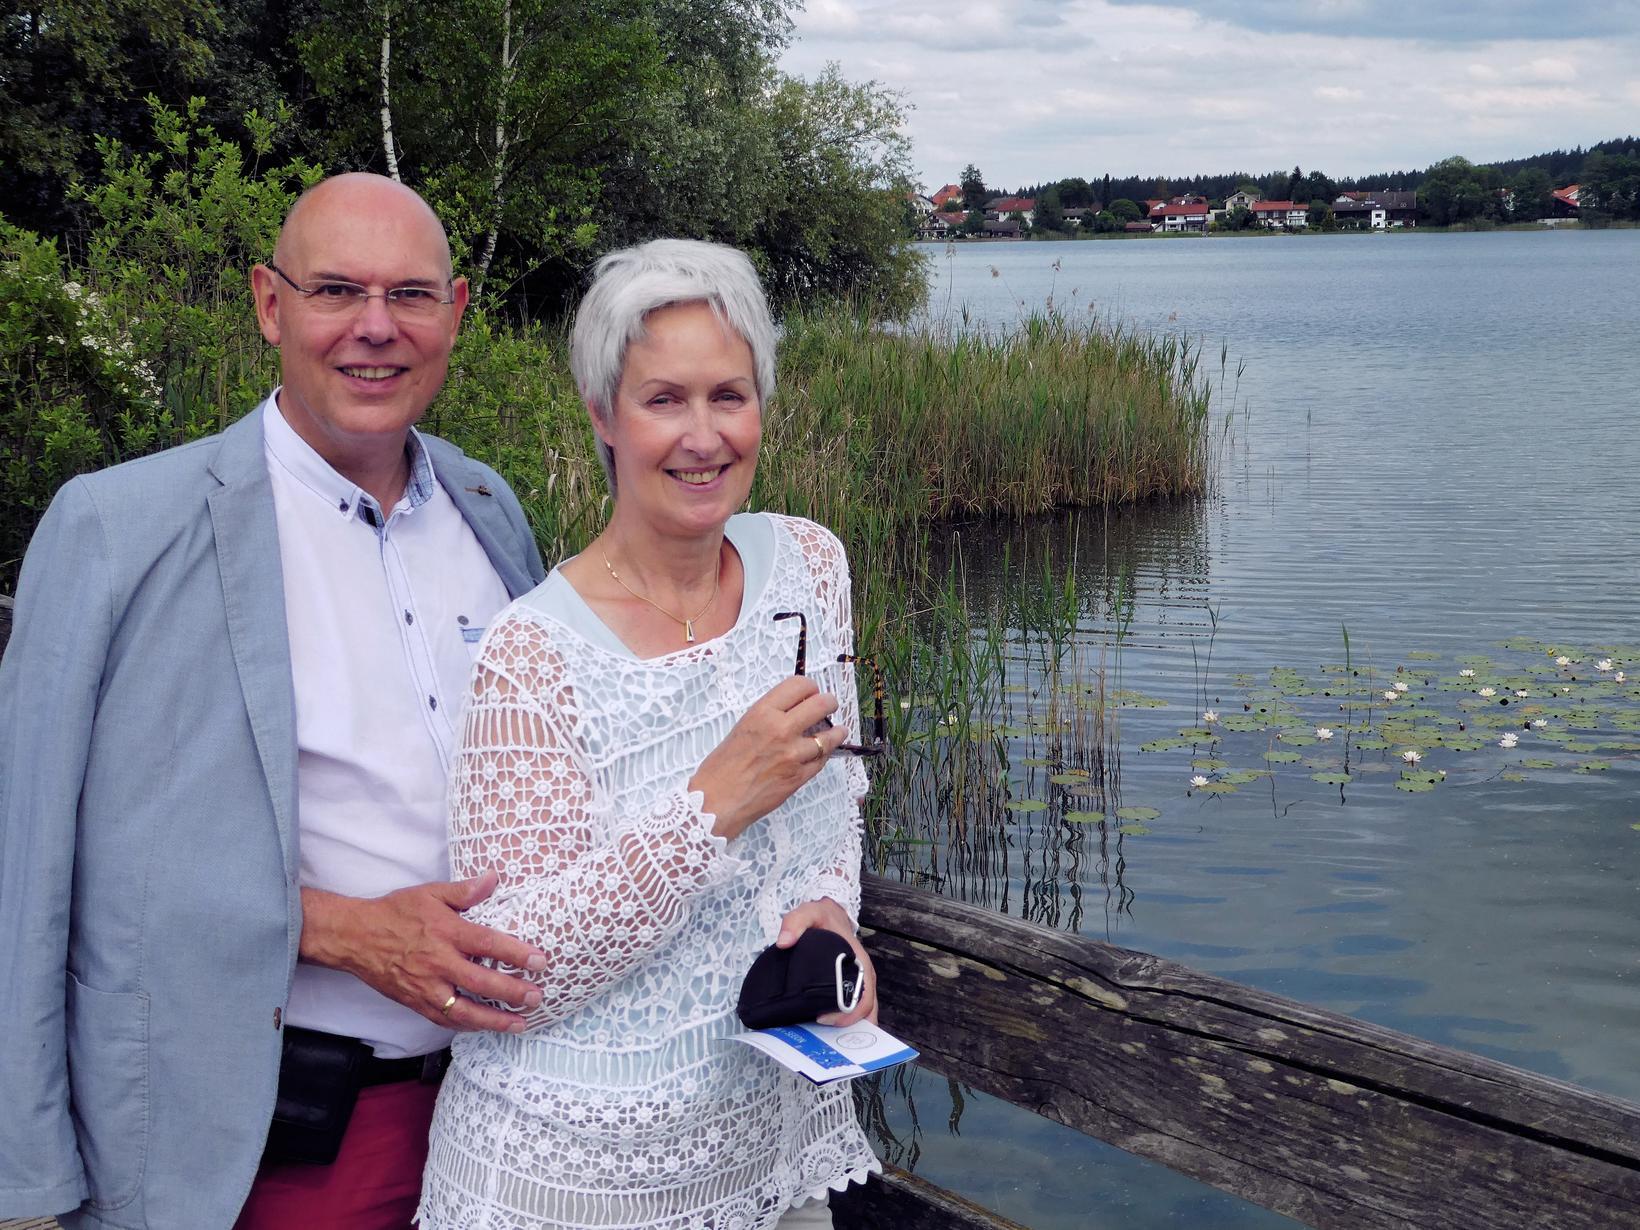 Matthias & Ruth from Engelsberg, Germany